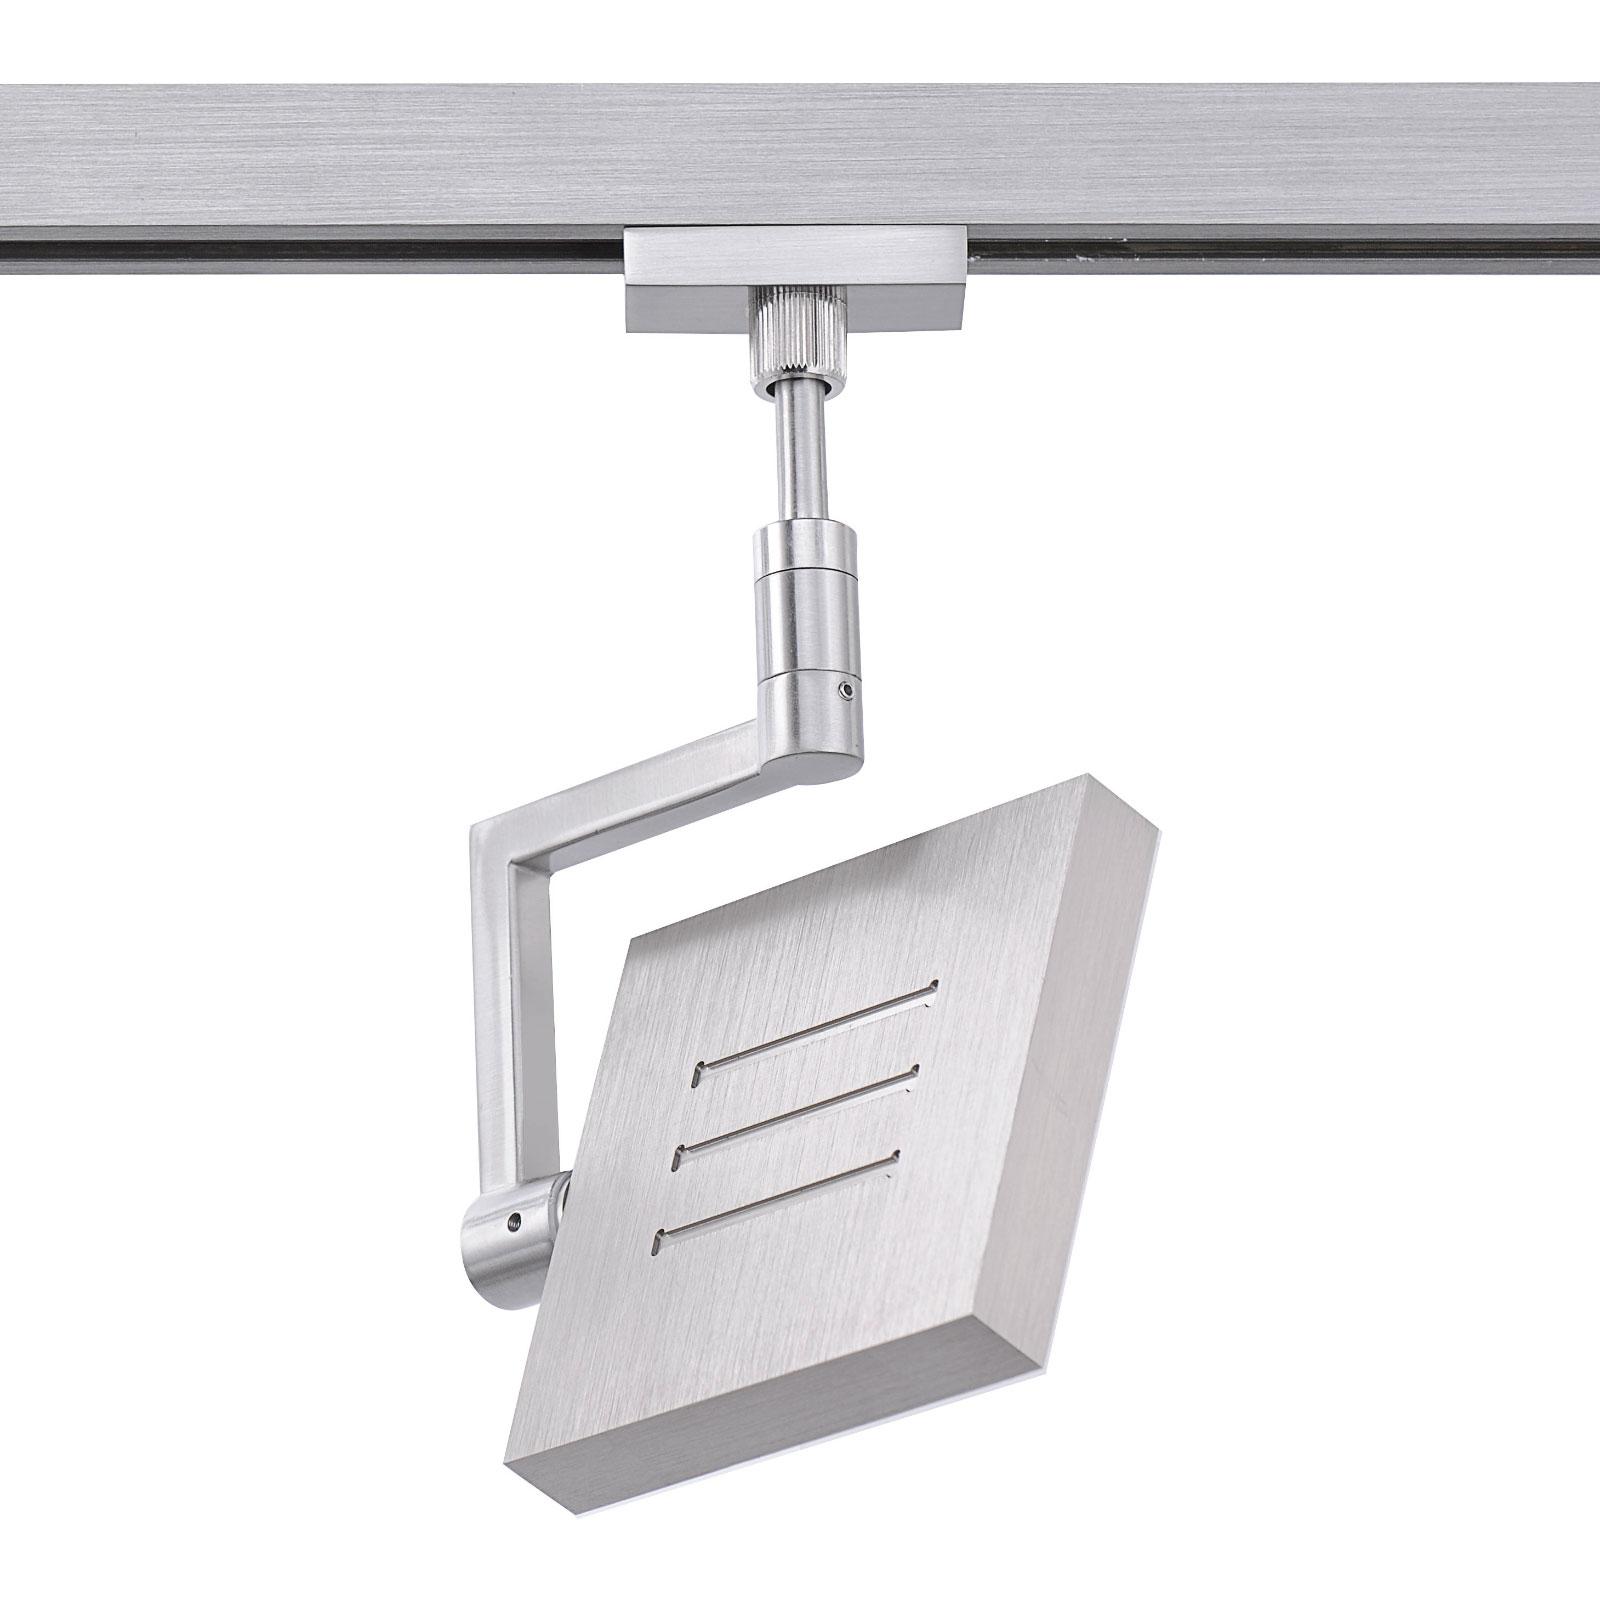 LED-Spot 70013 für HV-Track 4, 3-stufig dimmbar